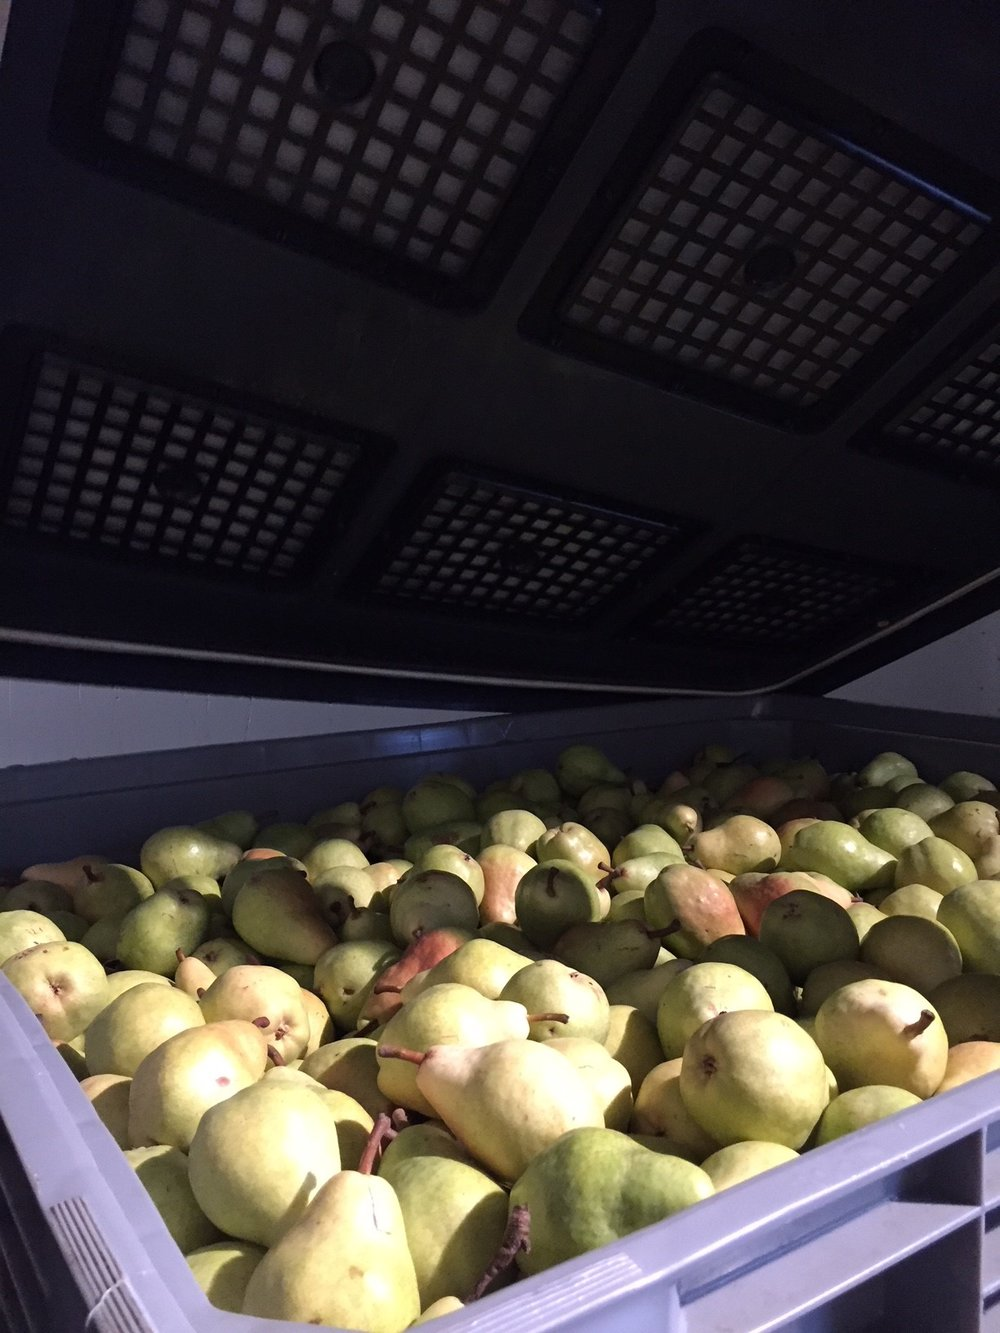 JMT US_pear storage.JPG